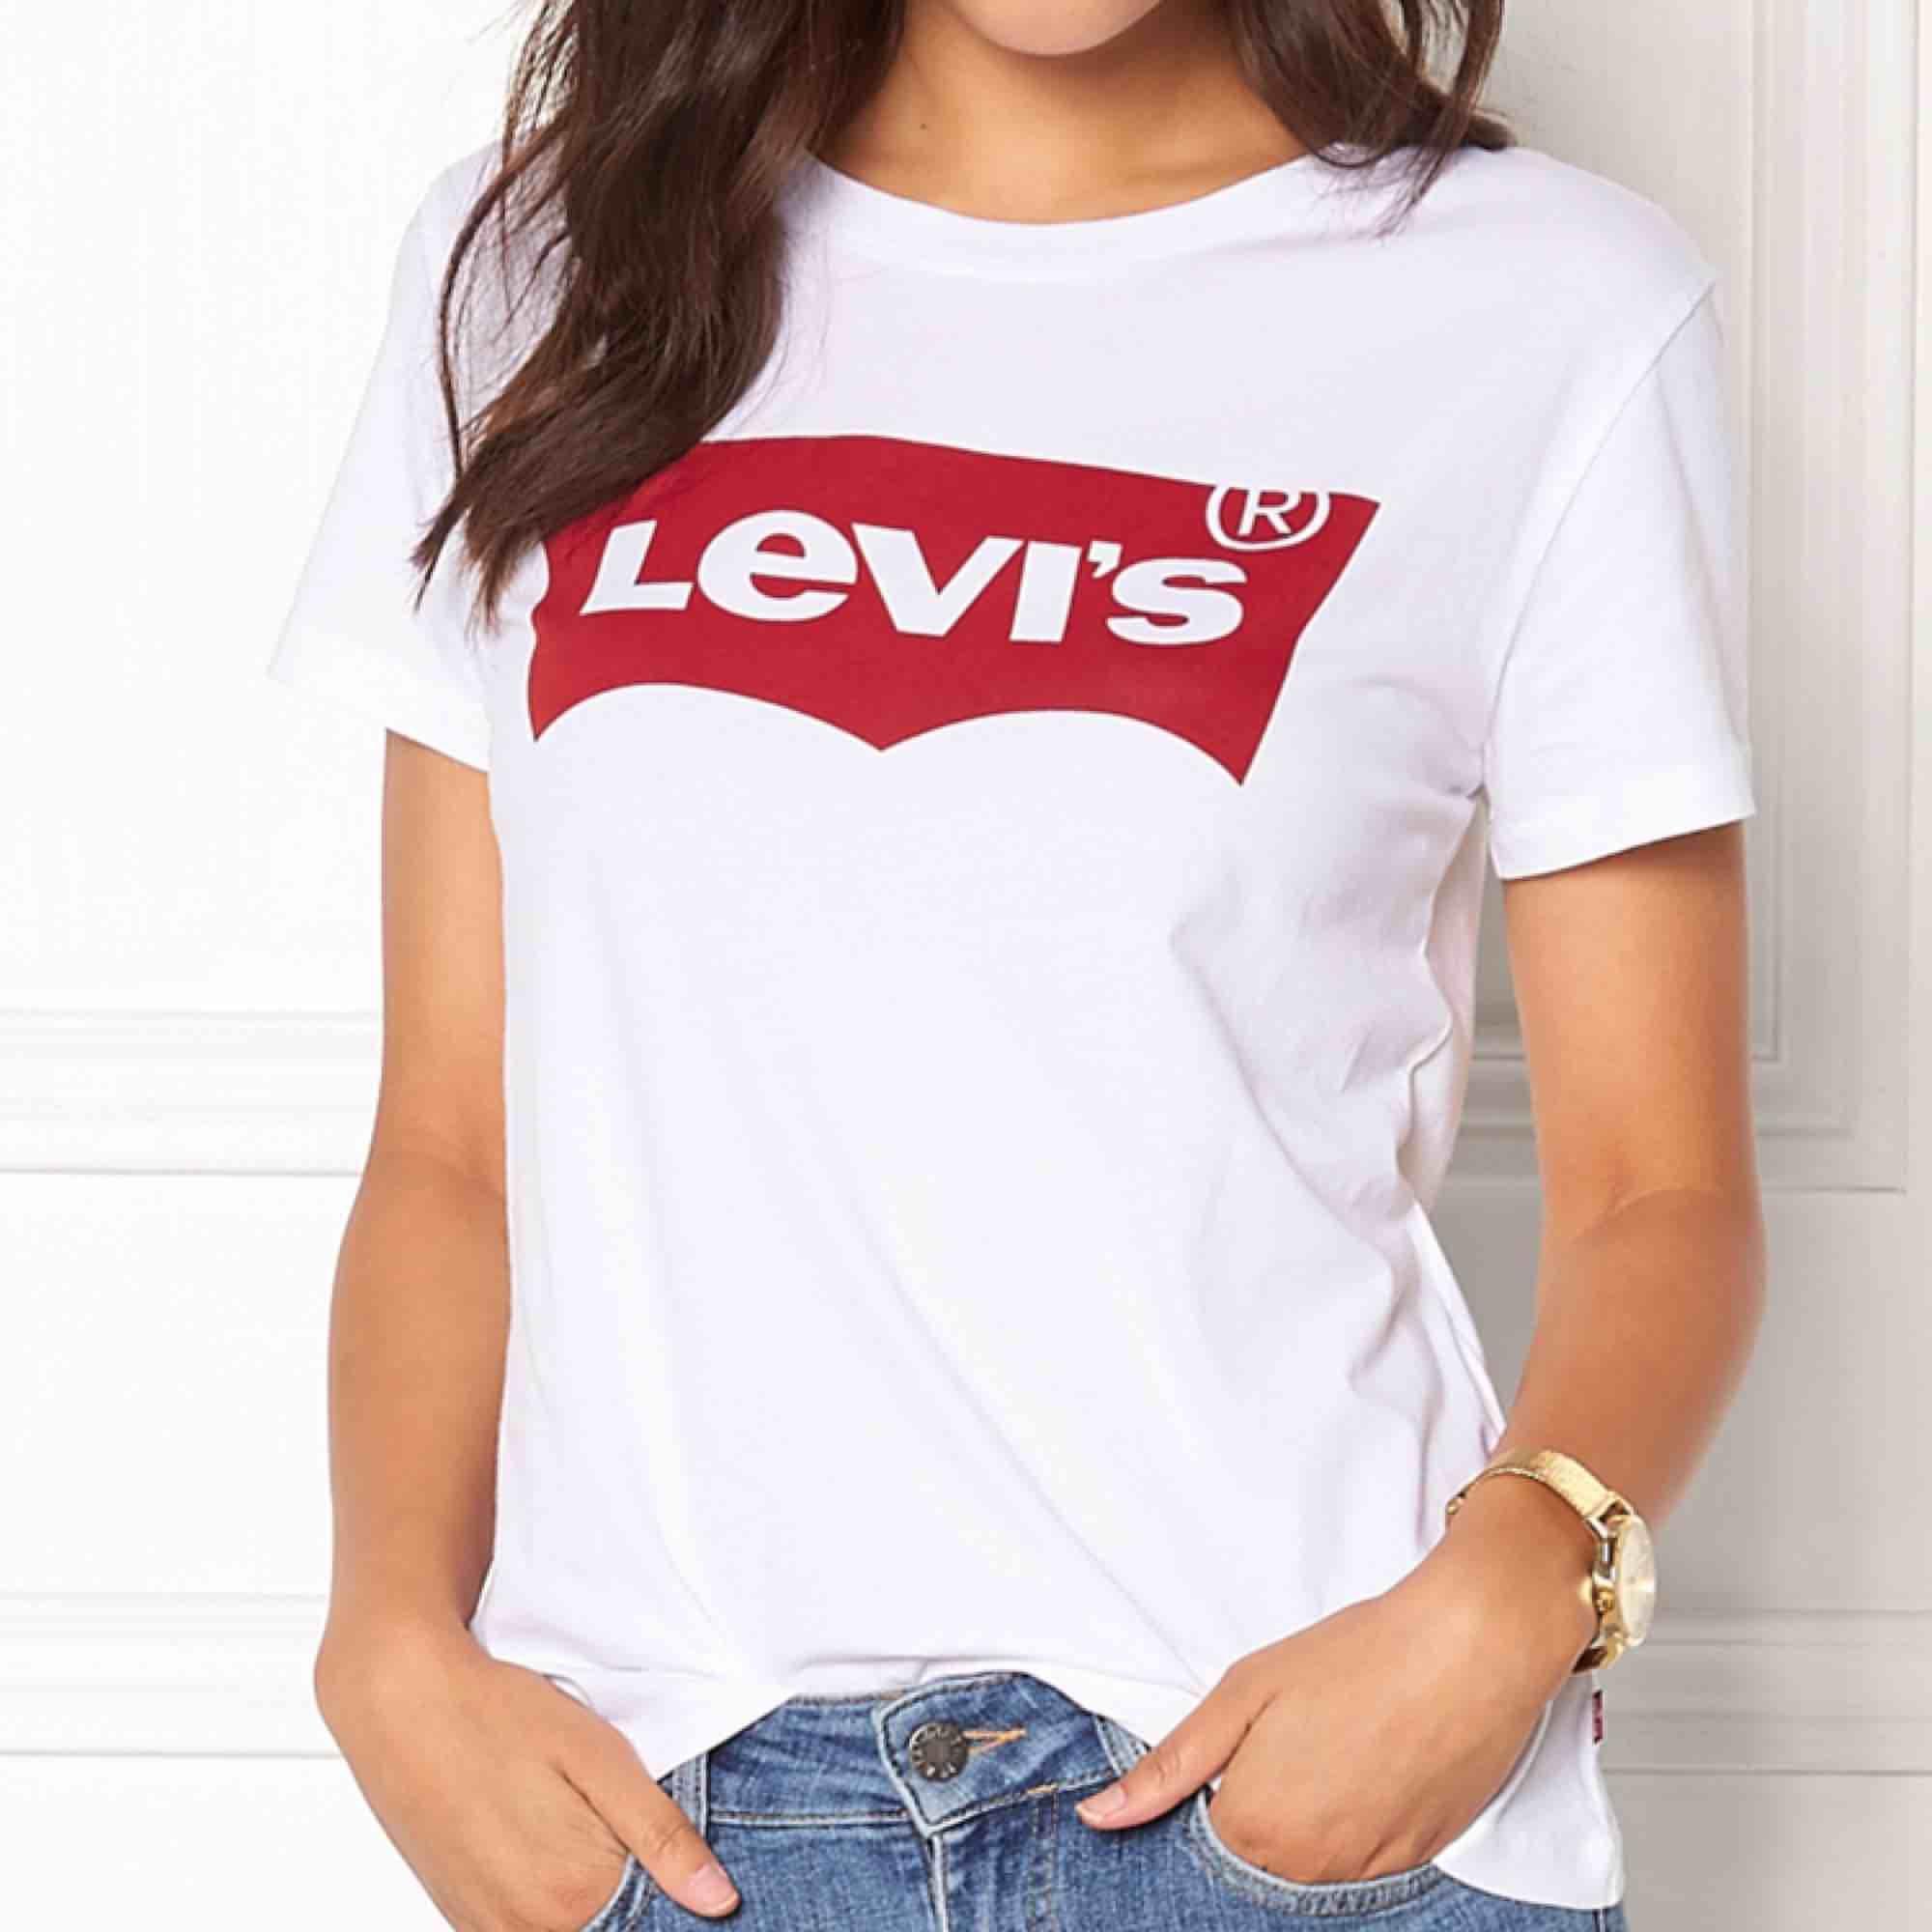 Toppen skick, 50 kr! . T-shirts.